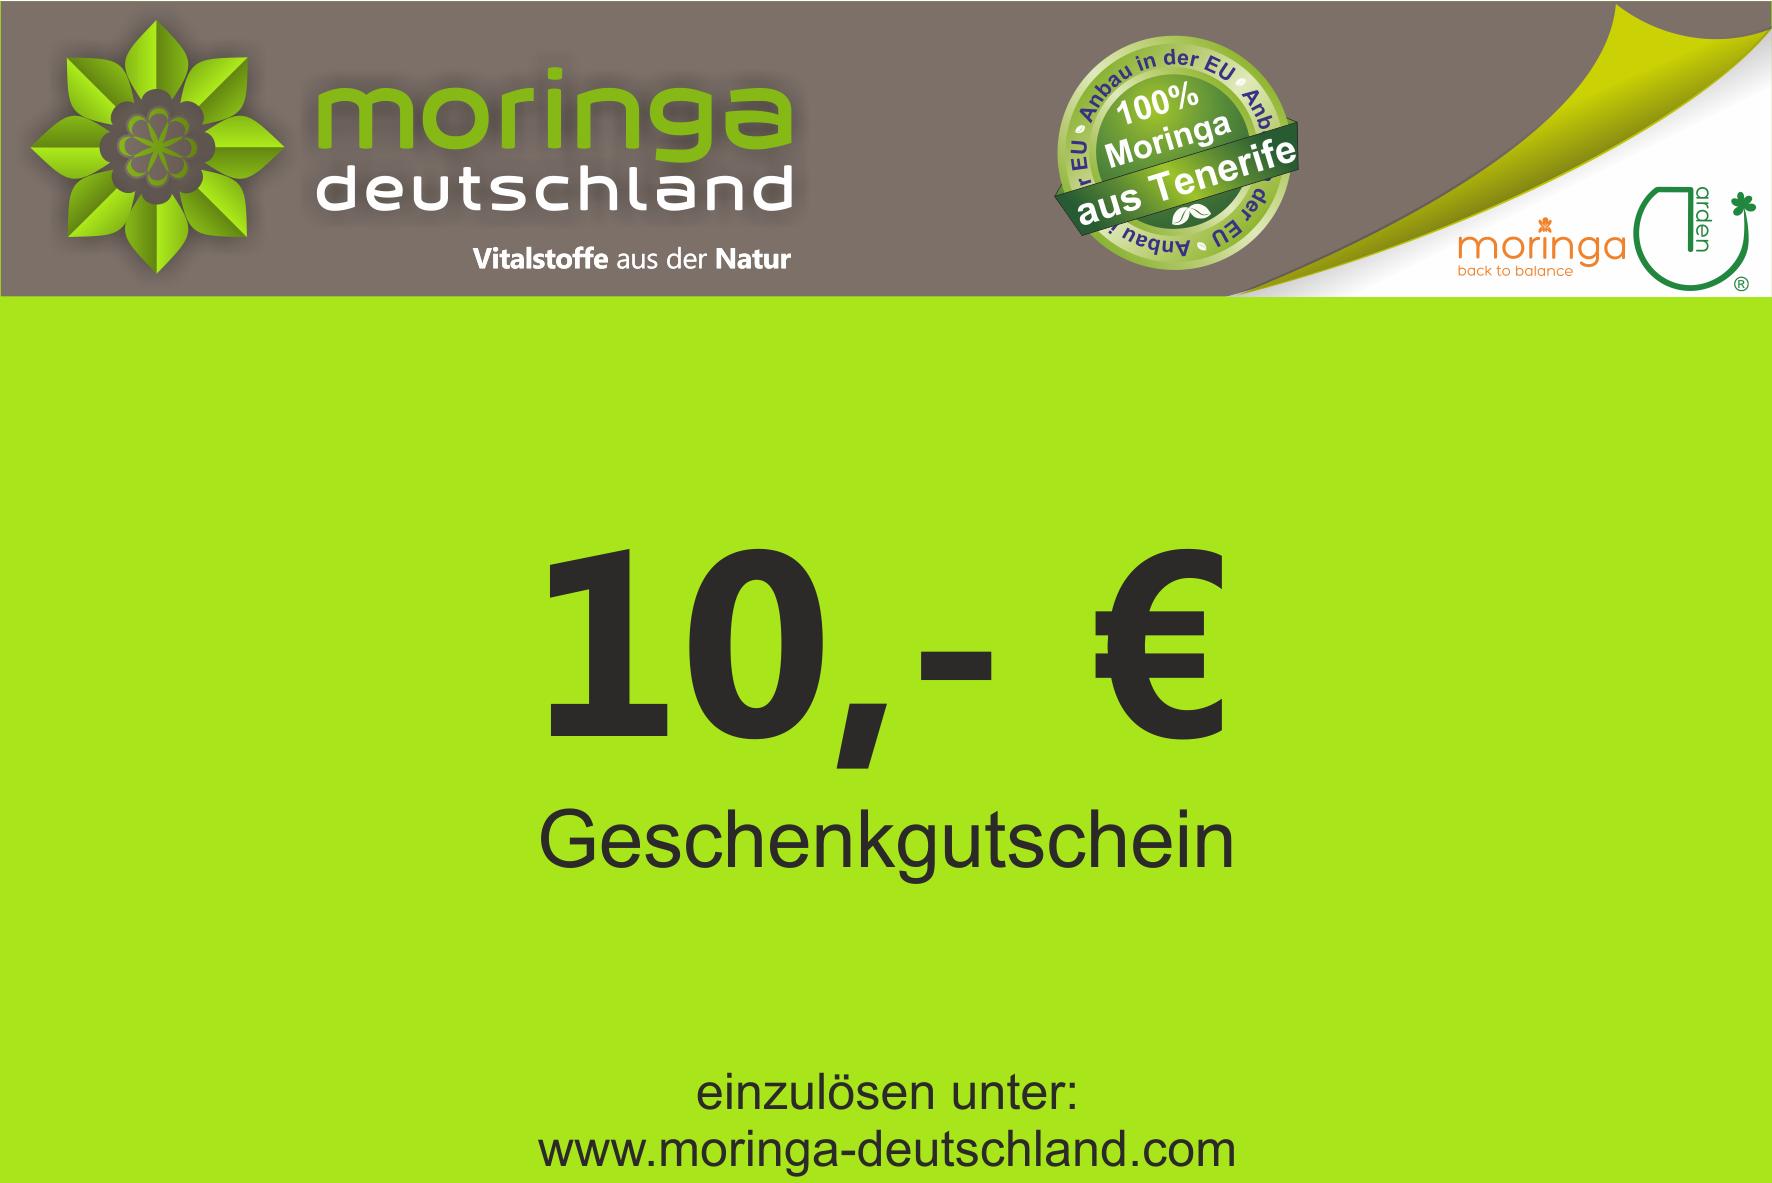 moringa deutschland online shop 10 geschenkgutschein moringa online kaufen. Black Bedroom Furniture Sets. Home Design Ideas